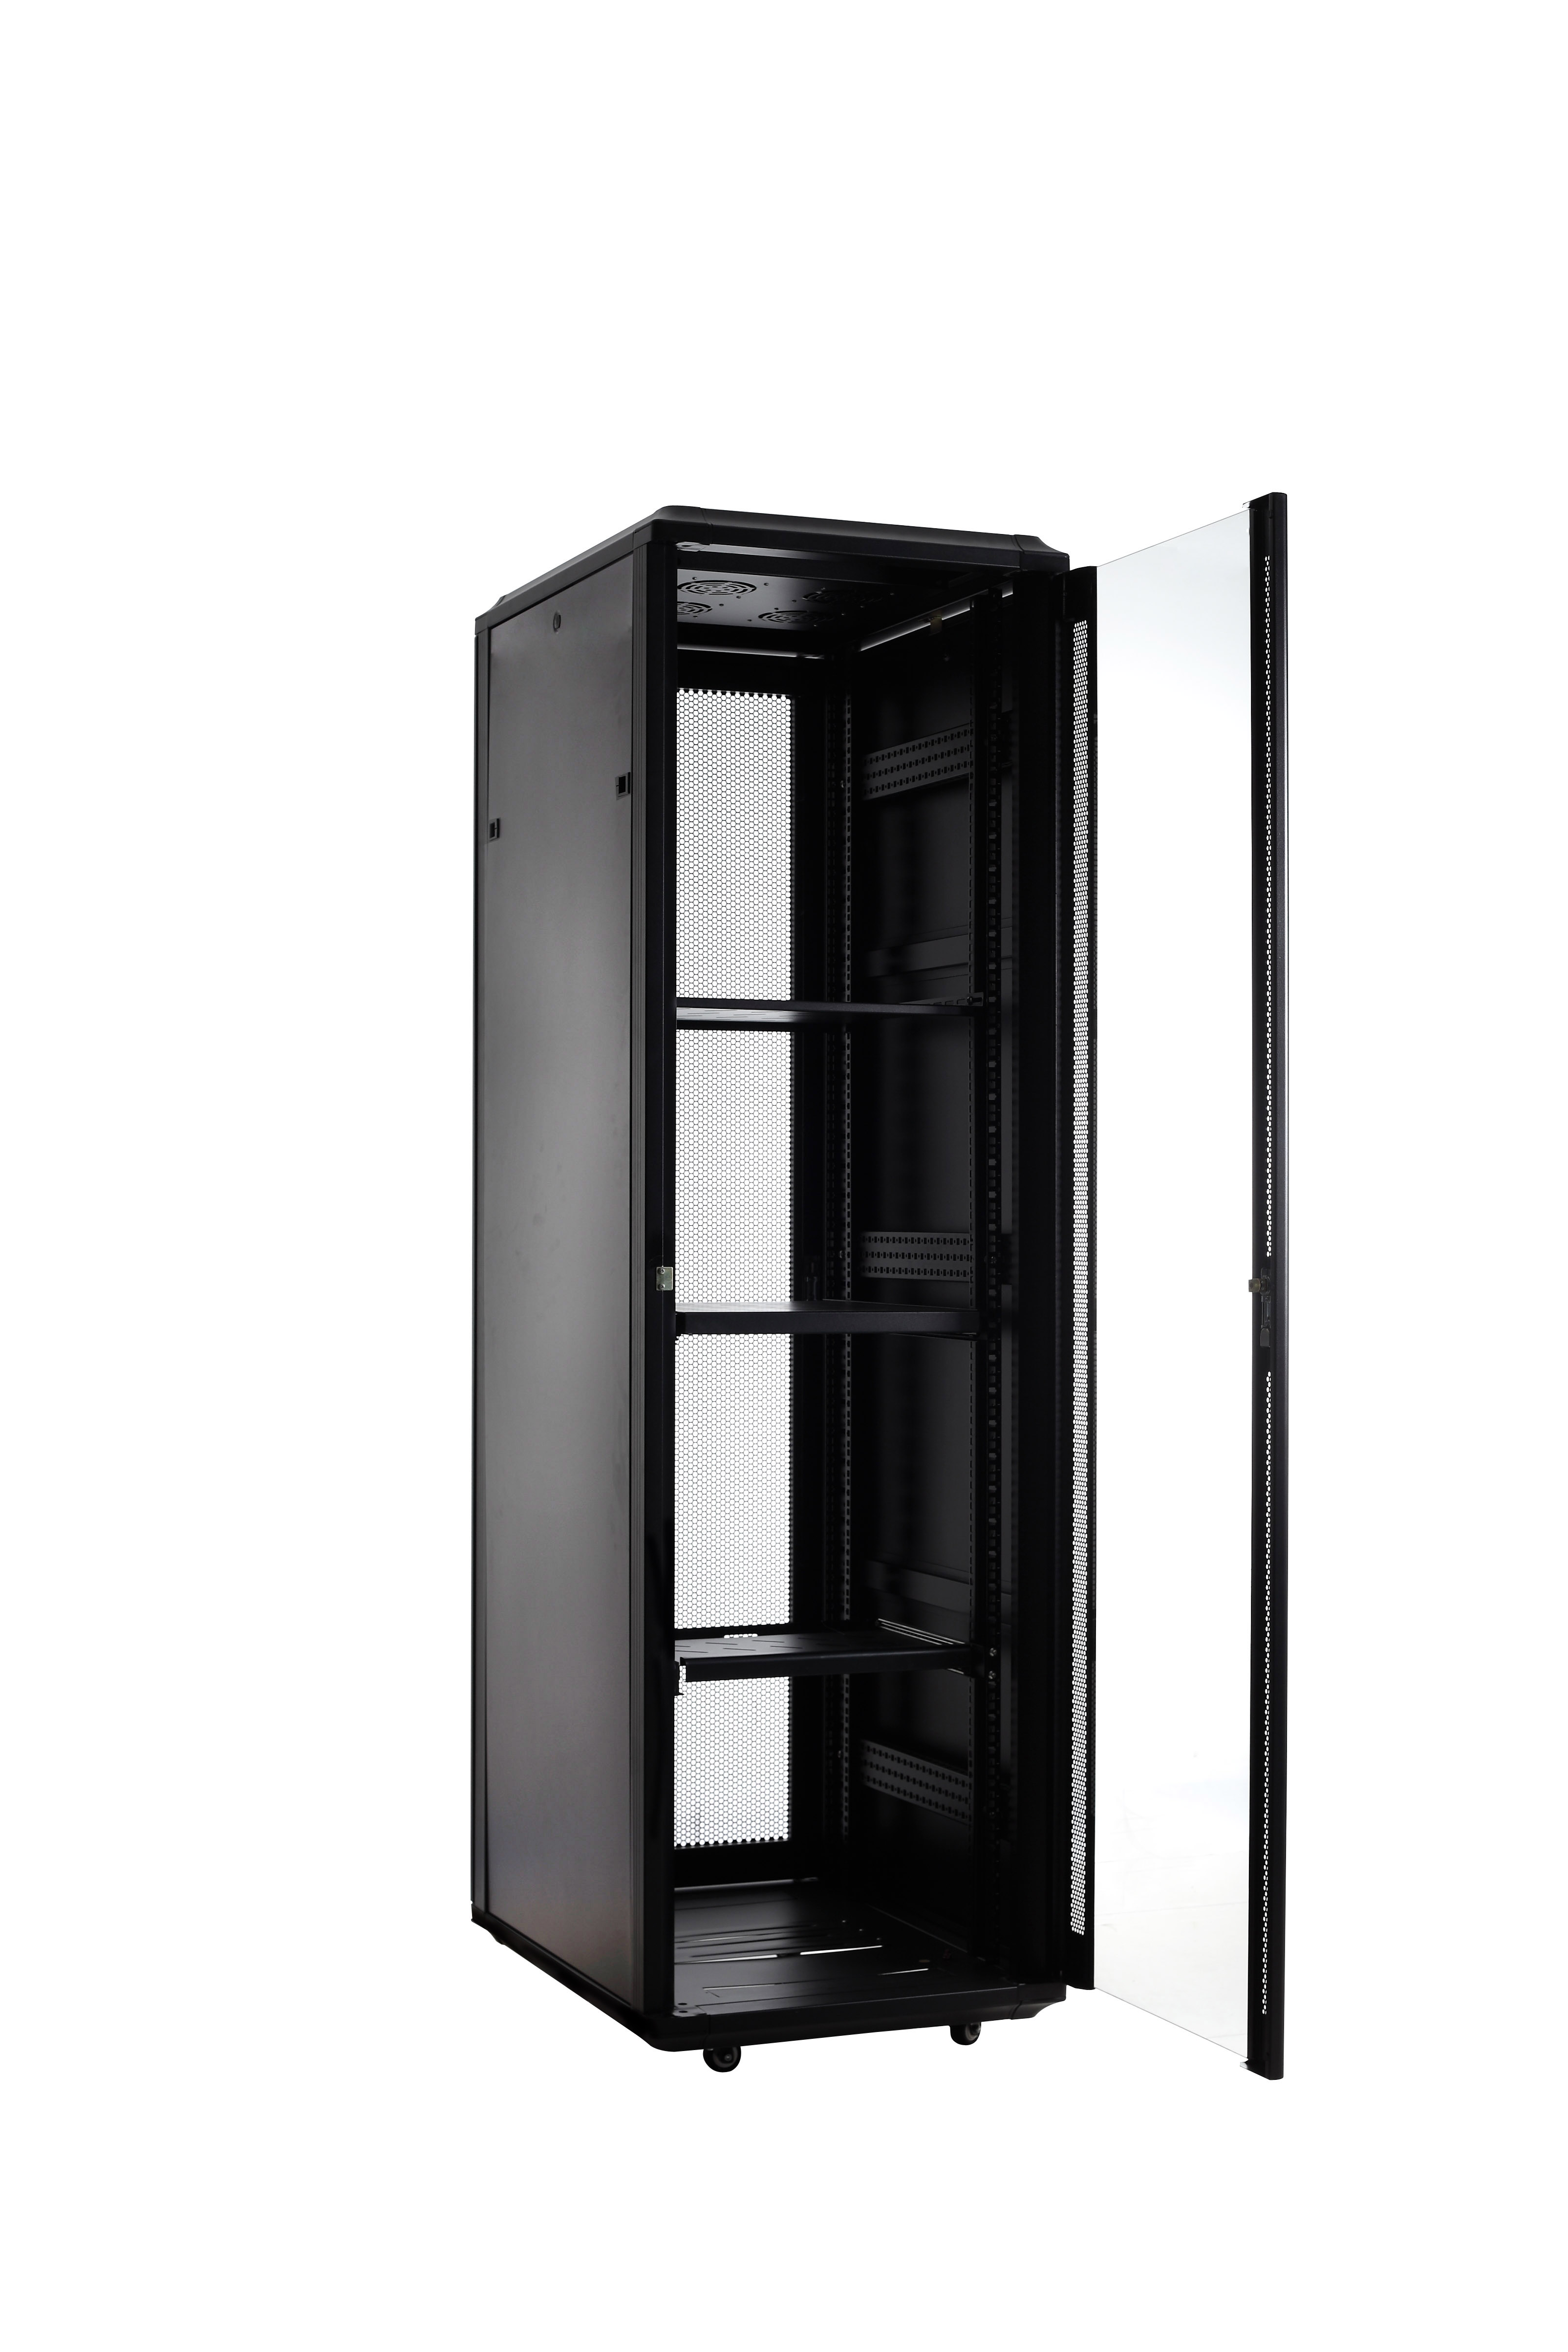 http://www.telemax.cn/upload/standing network cabinet.jpg